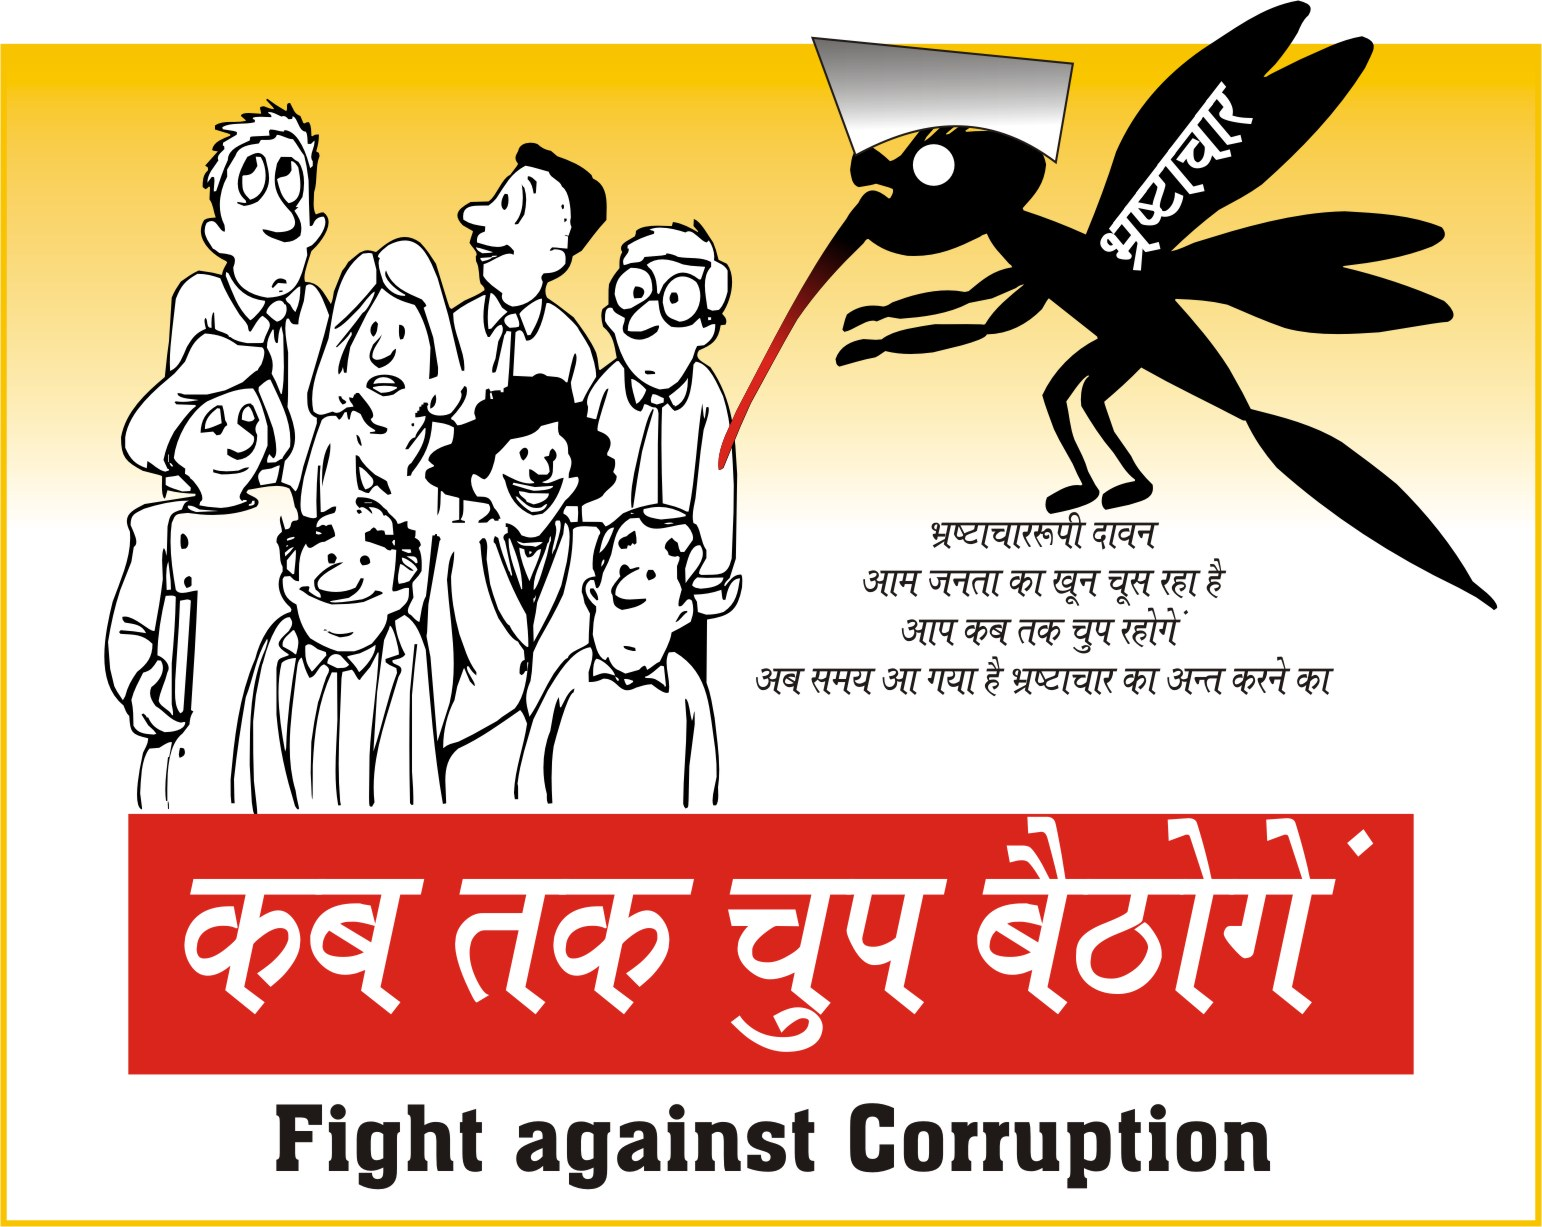 Corruption Poster: Correption